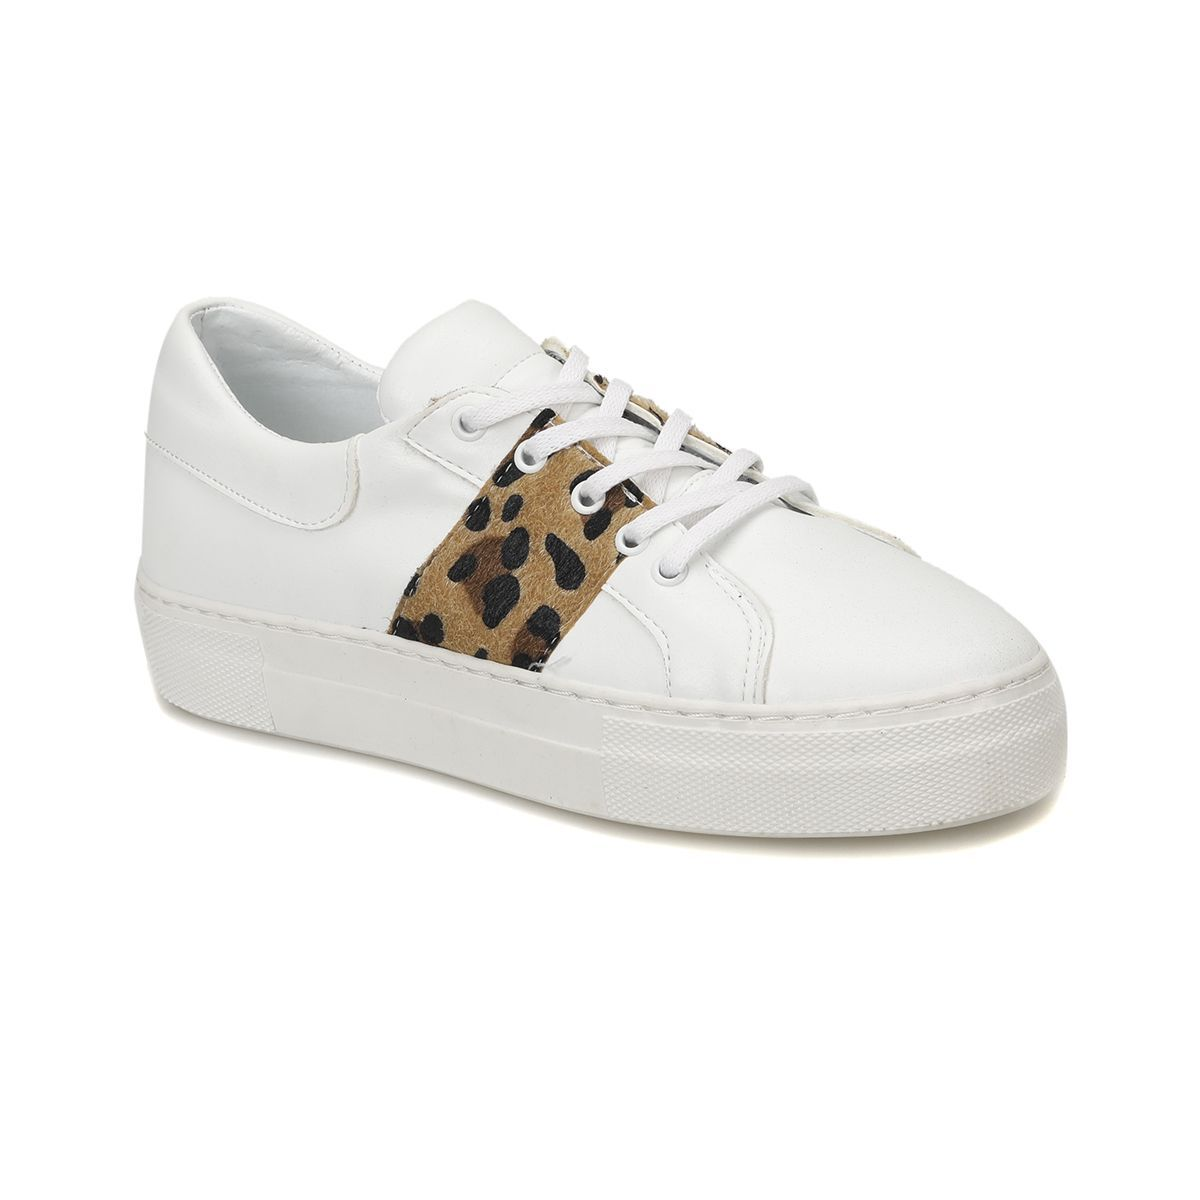 Butigo Butigo Stone01z89z Beyaz Leopar Kadin Sneaker Ayakkabi Flo Ayakkabi Sneaker Ayakkabilar Leopar